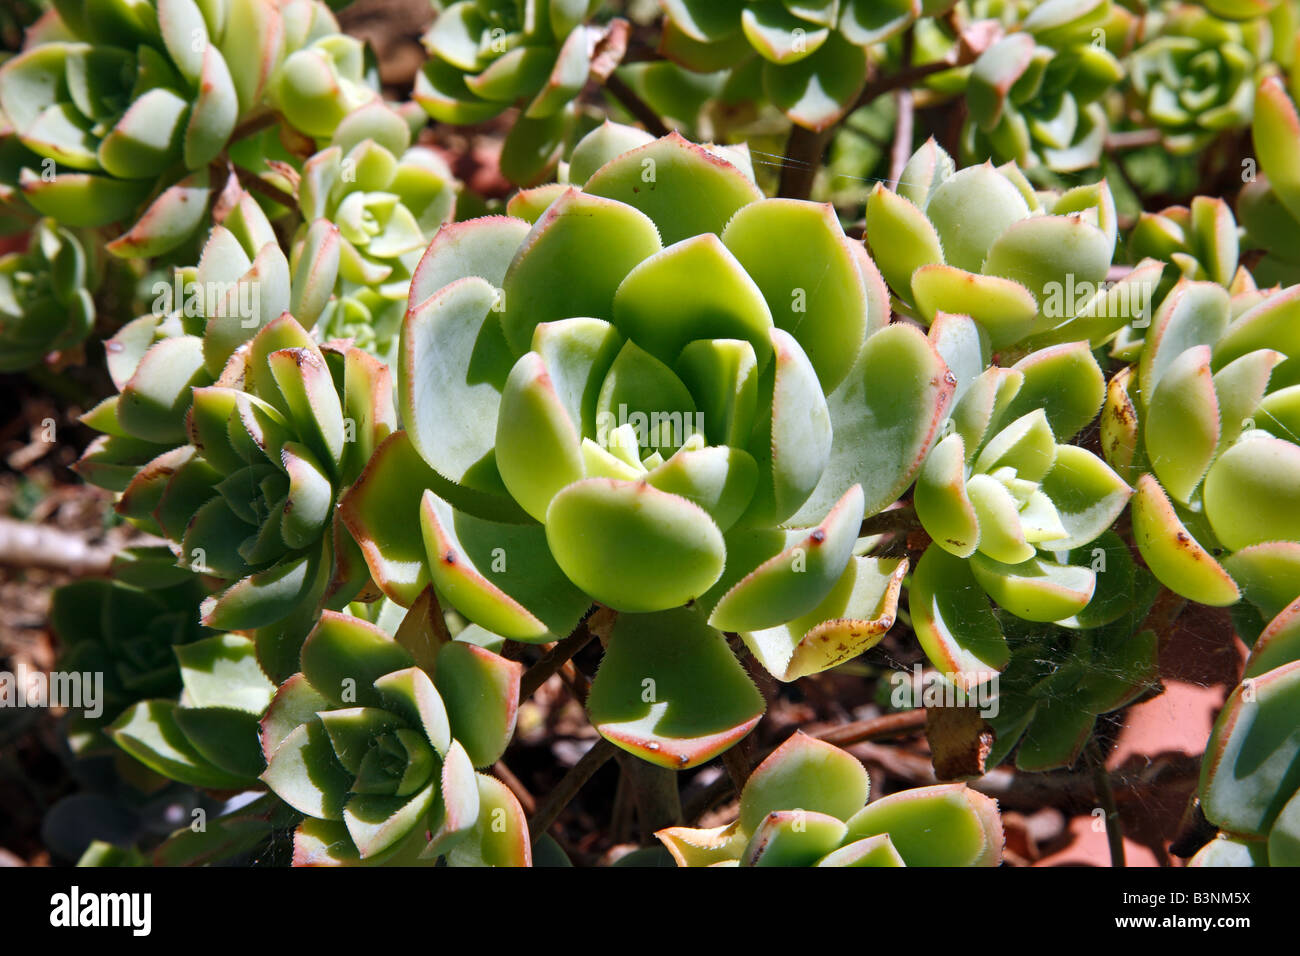 Natur, Pflanzen, Dickblattgewaechse, Crassulaceae, Hauswurze, Sempervivum - Stock Image